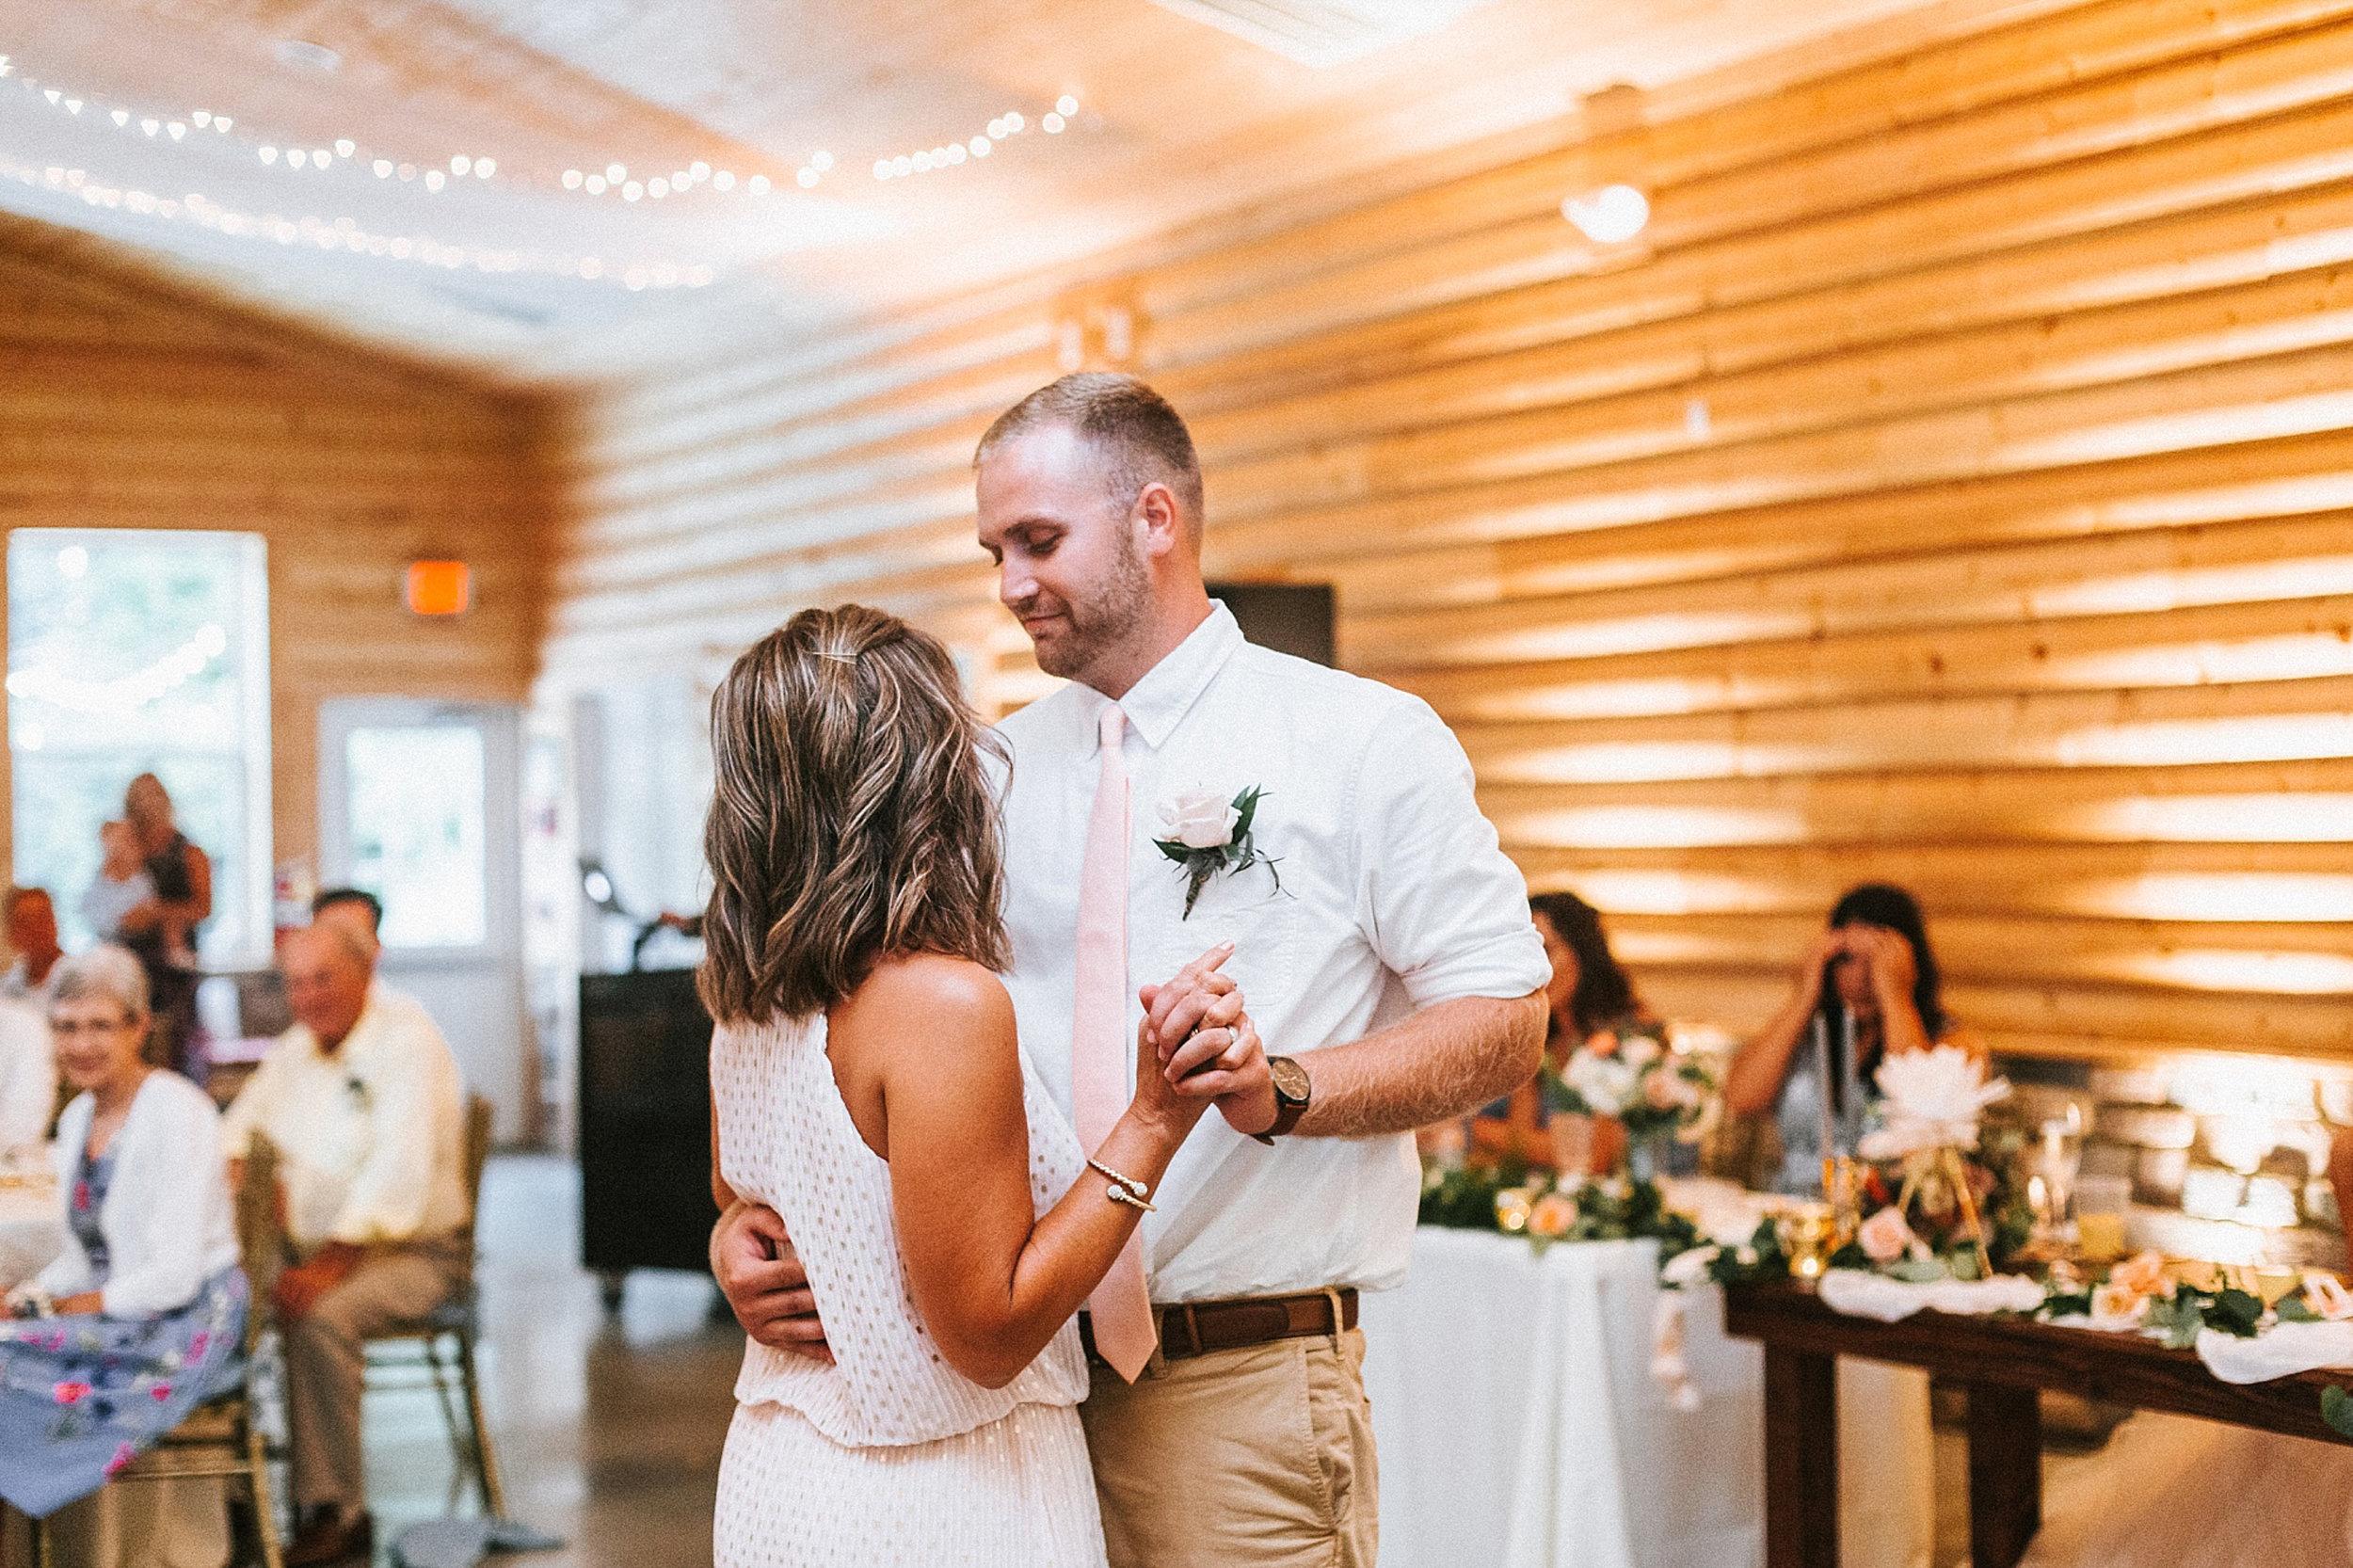 Brooke Townsend Photography - Cincinnati Wedding Photographer (145 of 153).jpg